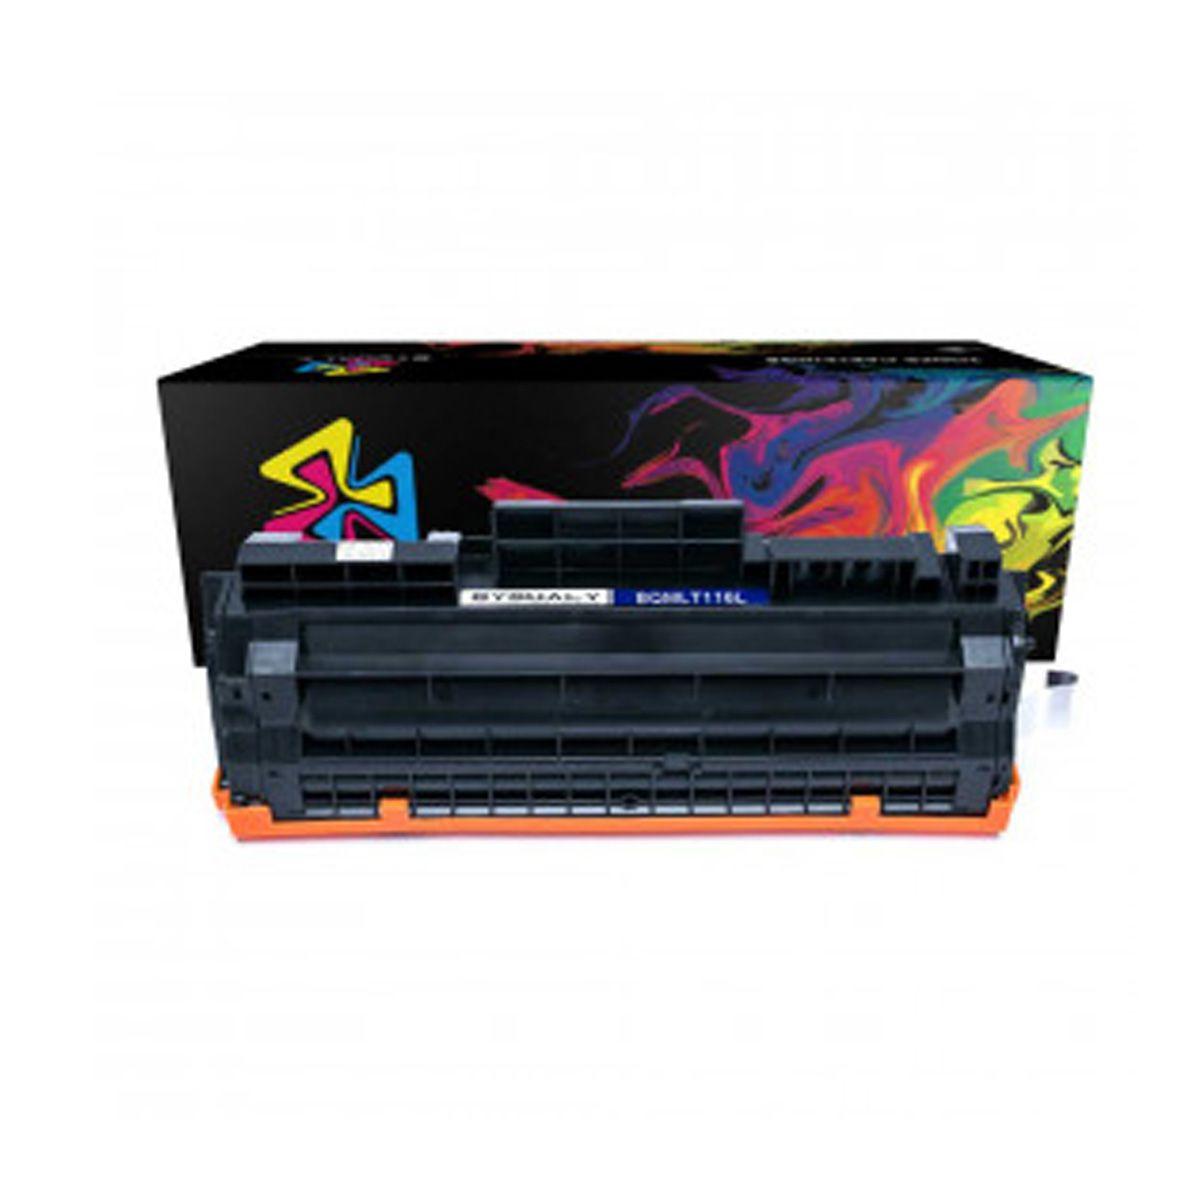 Toner D116L D116 116 - M2875 M2885 M2825 M2835DW Compativel a Samsung